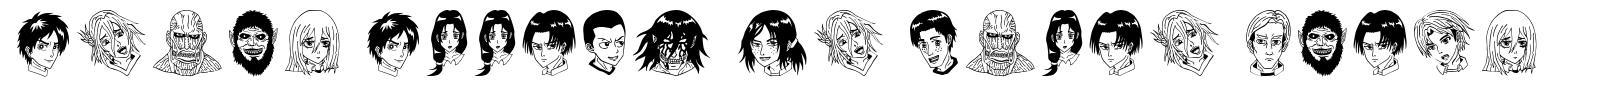 Anime Attack On Titan Image font